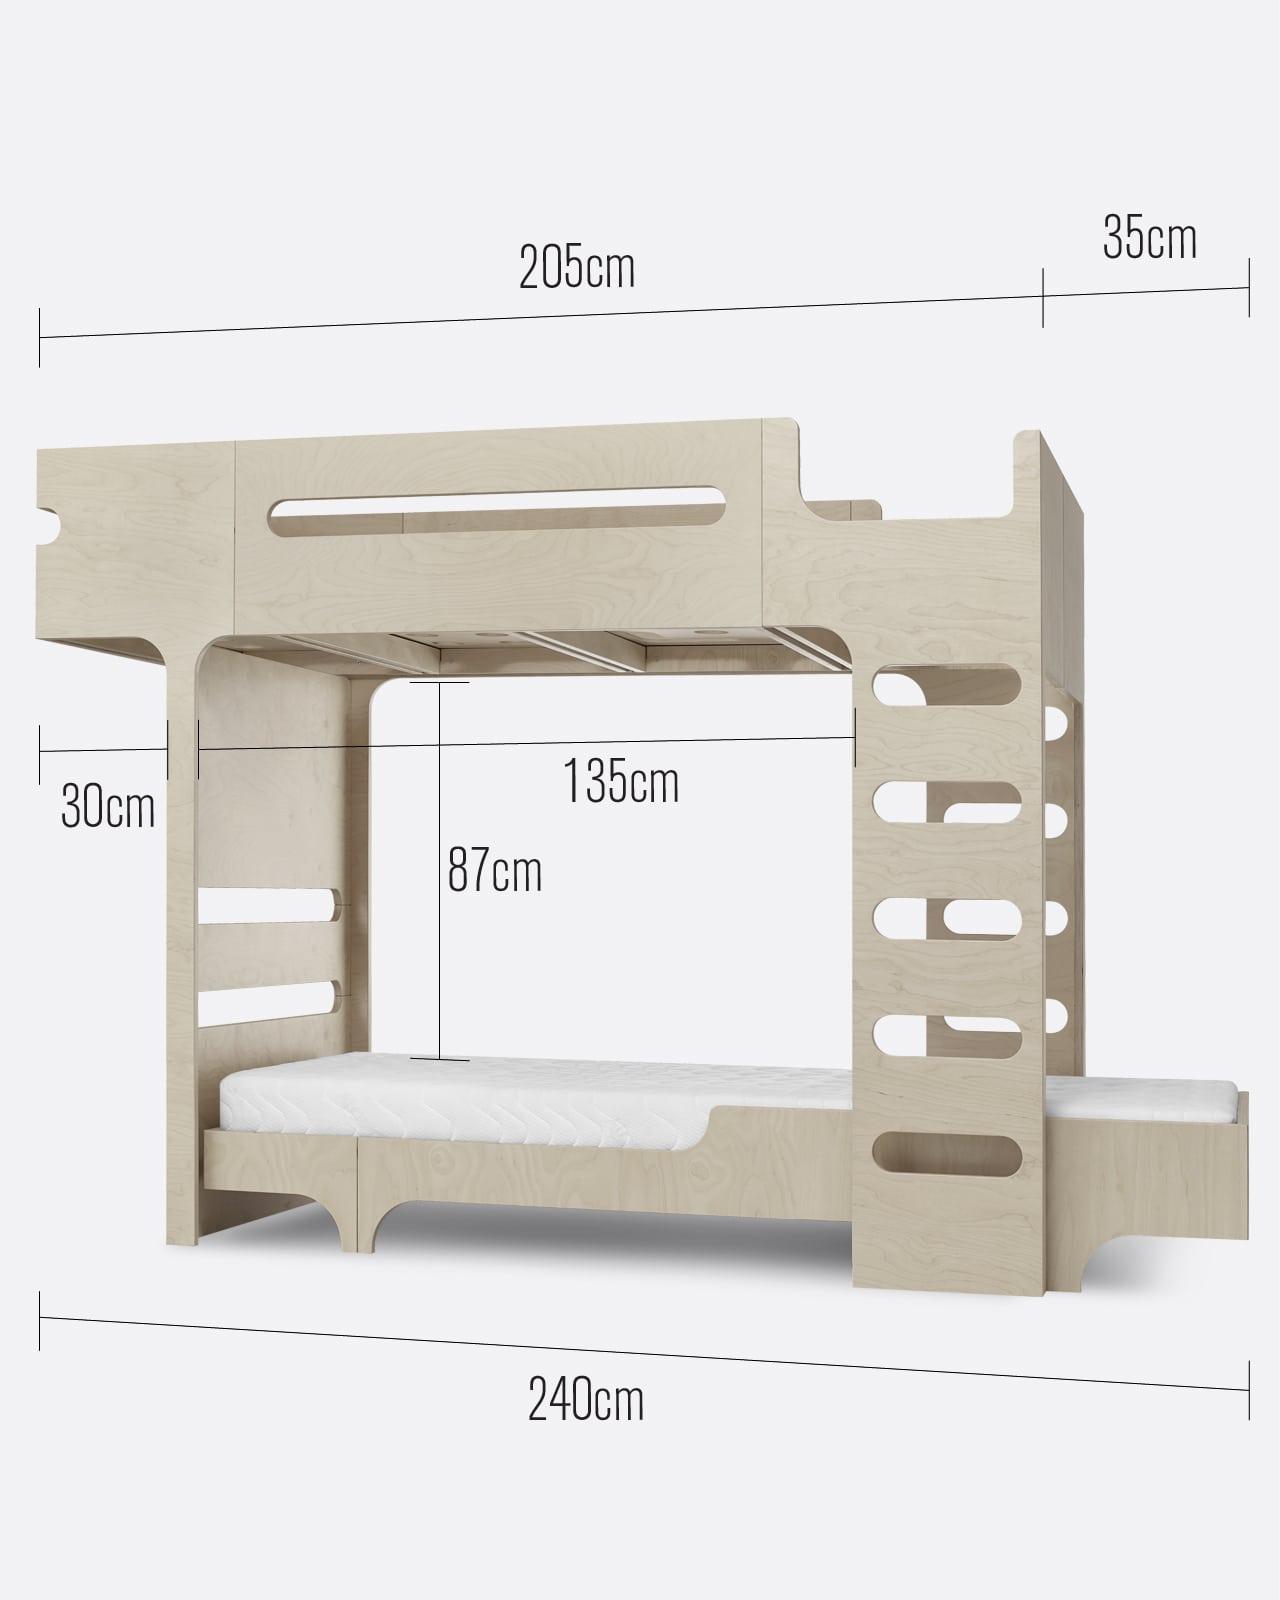 F A75 Bunk Bed For 2 Children Designer Furniture Rafa Kids